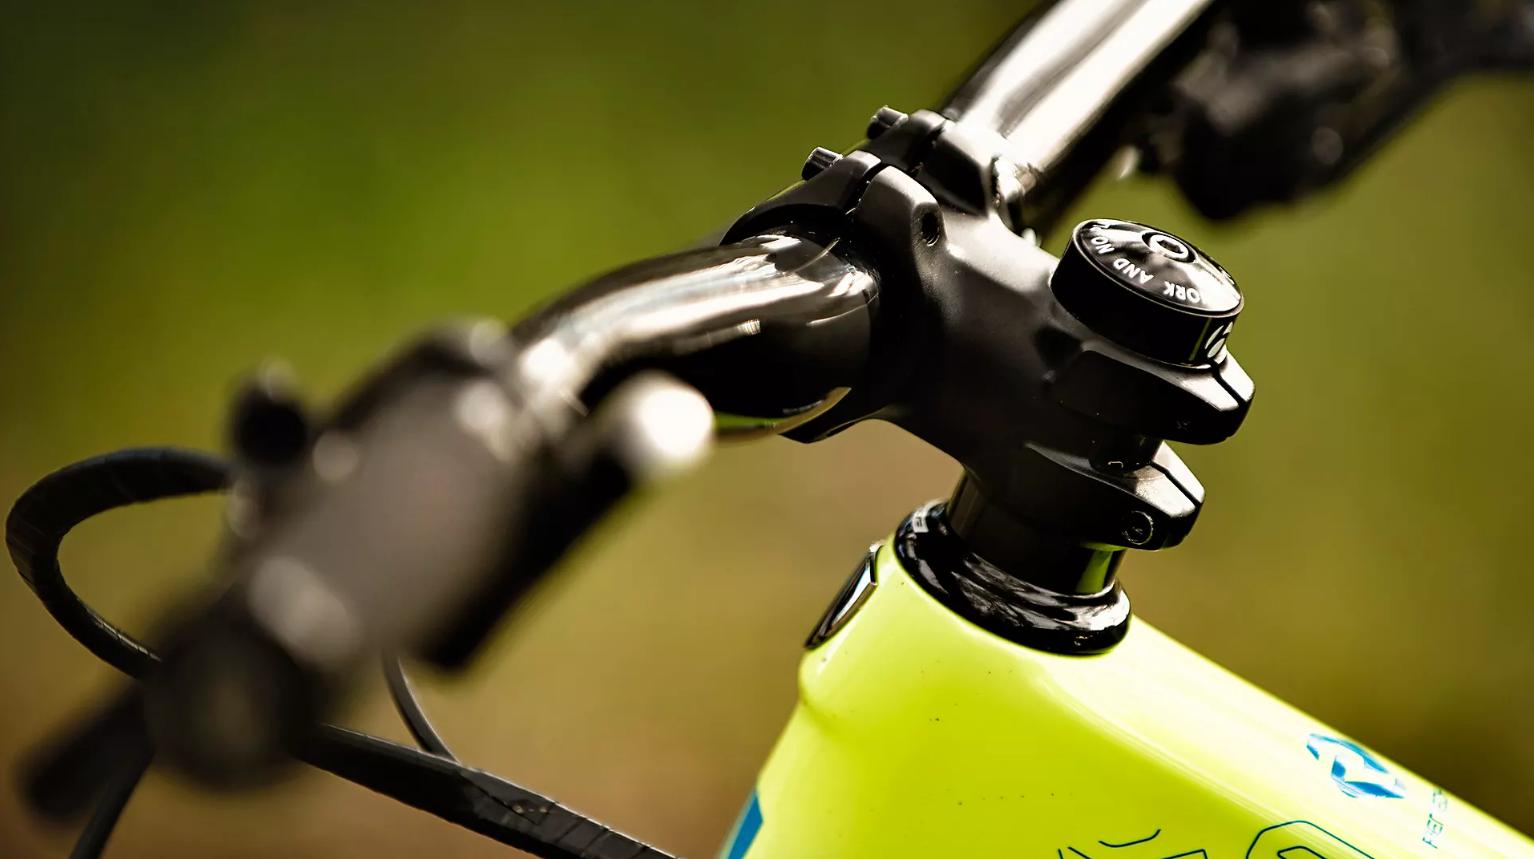 Mountain Bike - Accessories cover image